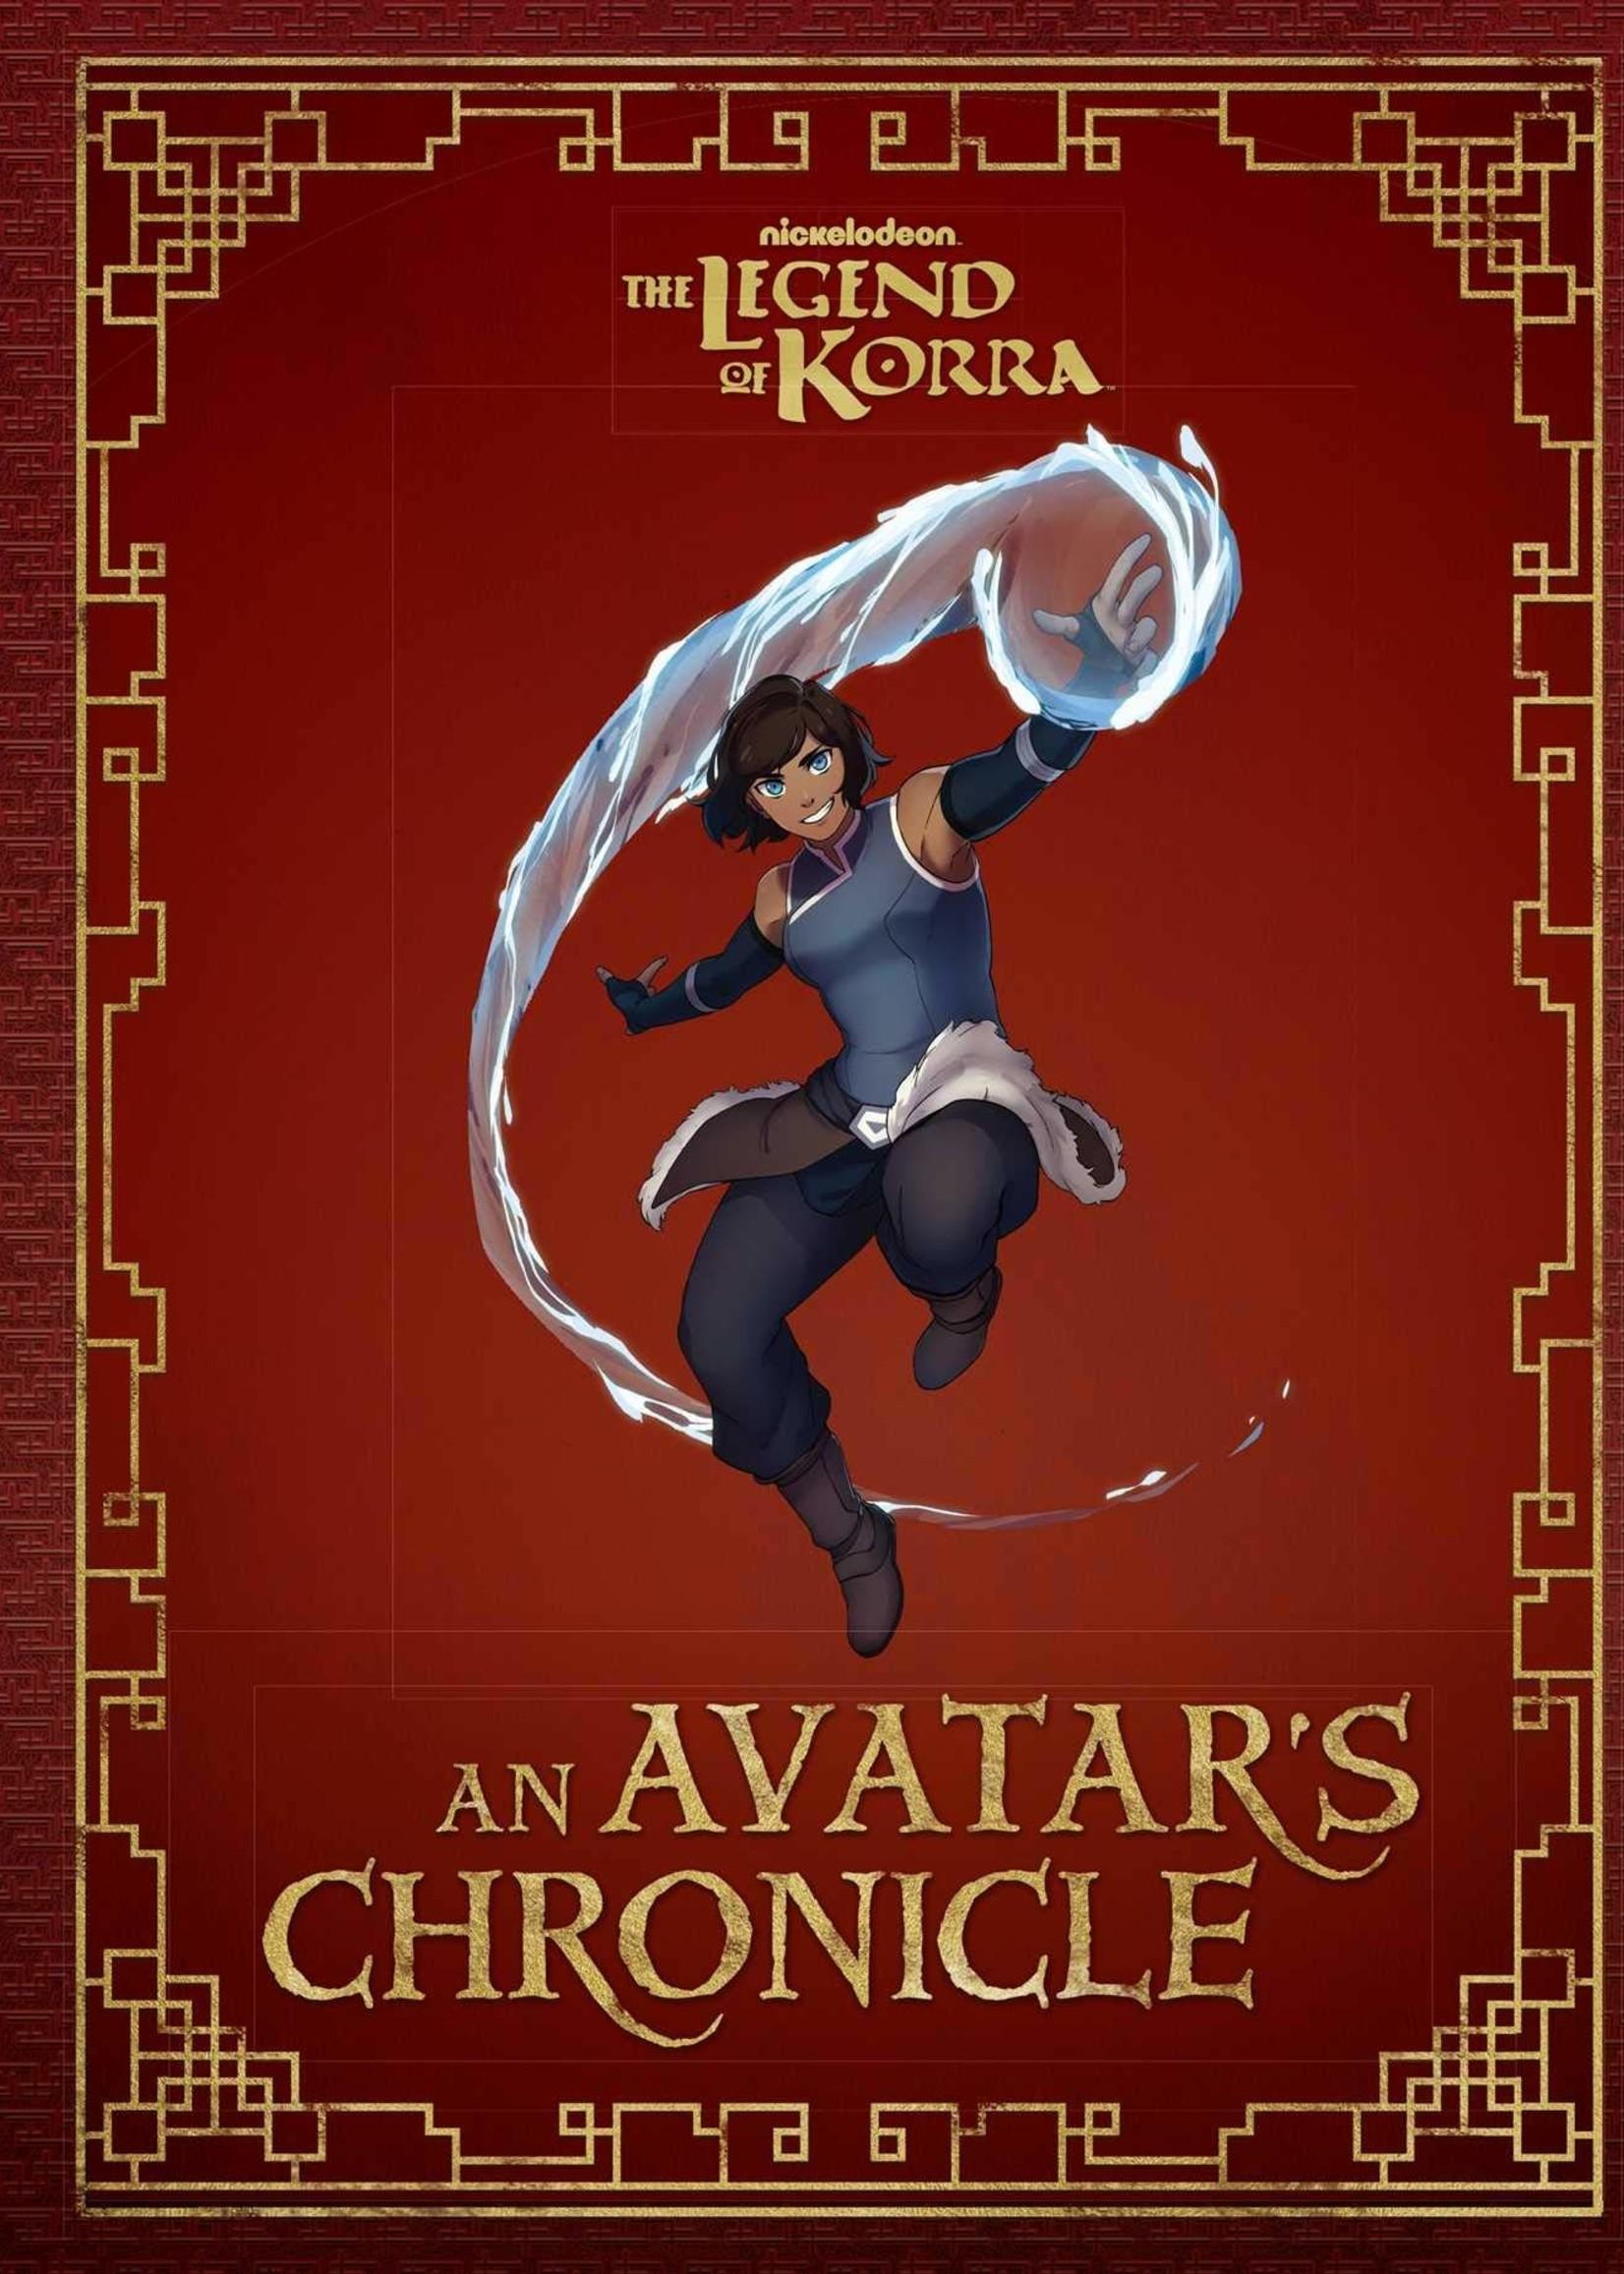 The Legend of Korra: An Avatar's Chronicle - Hardcover